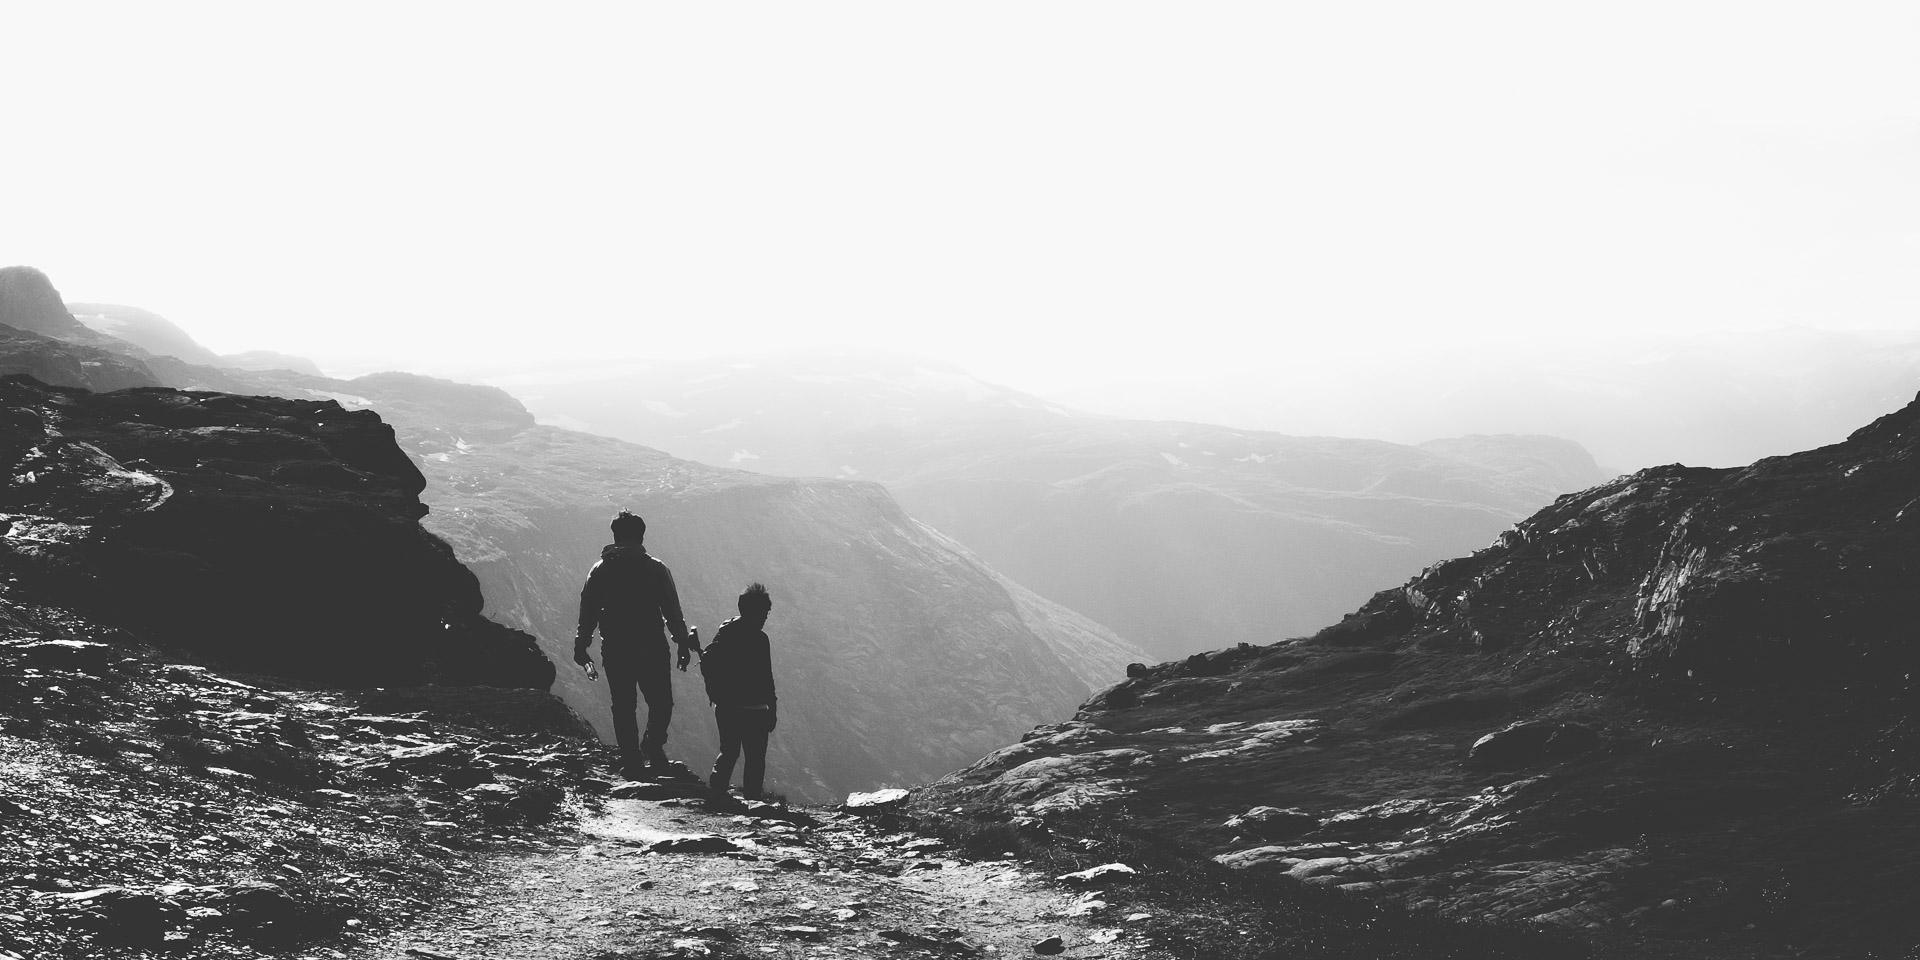 Trolltunga hike, photo guide, travel, day hike, Norway, hardangerfjord